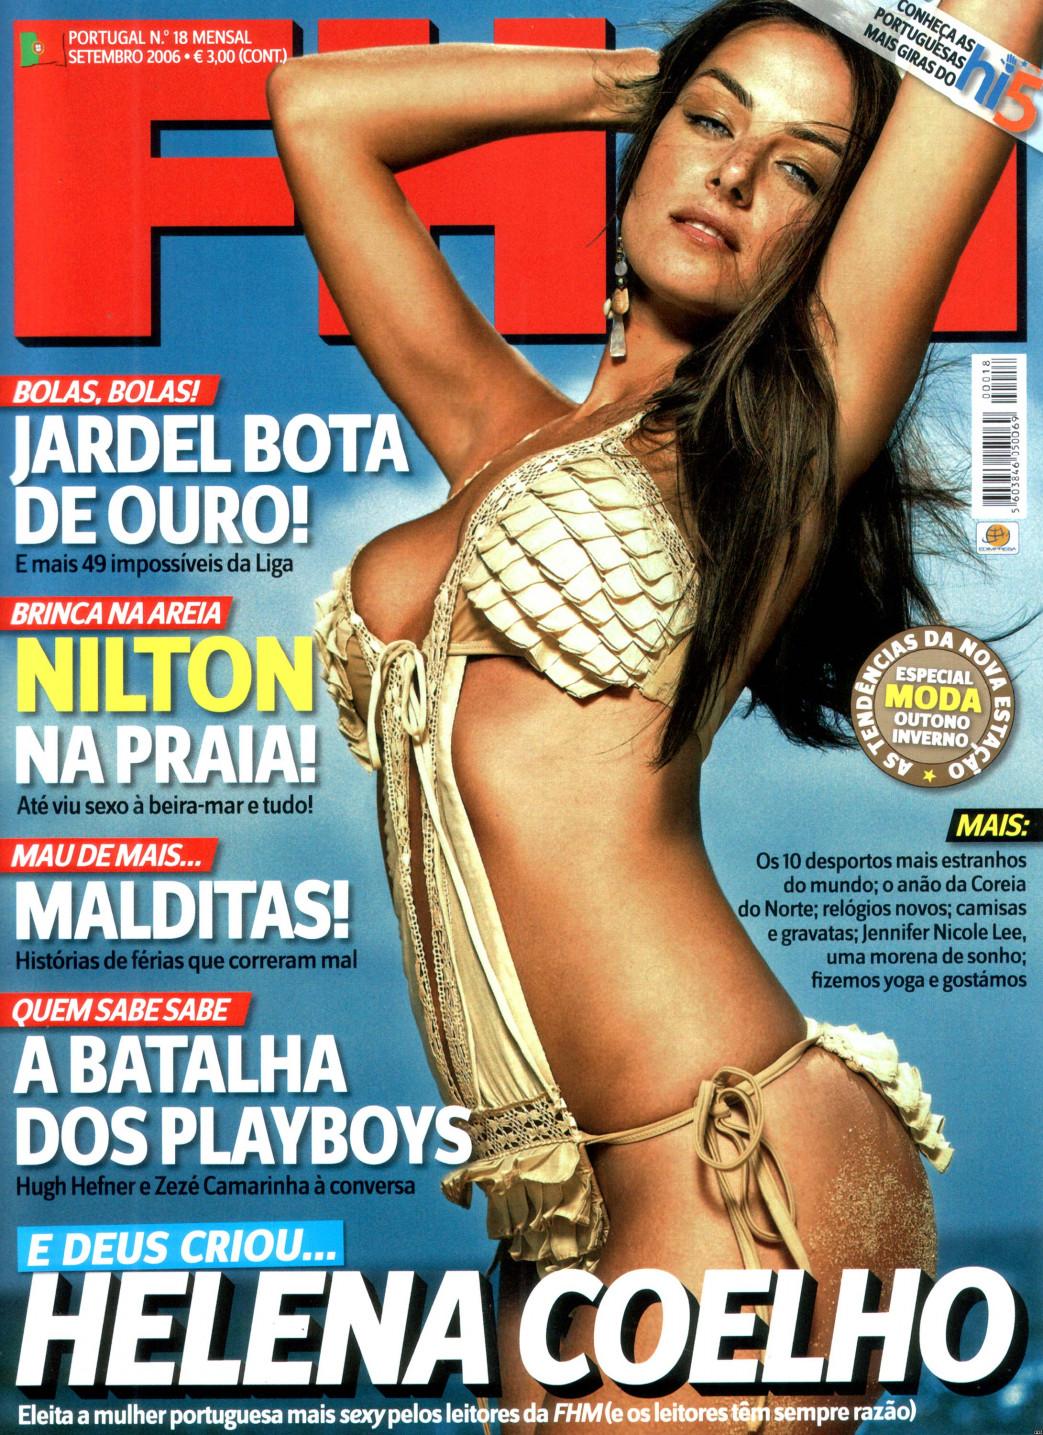 Helena-Coelho---FHM-2006-0.jpg